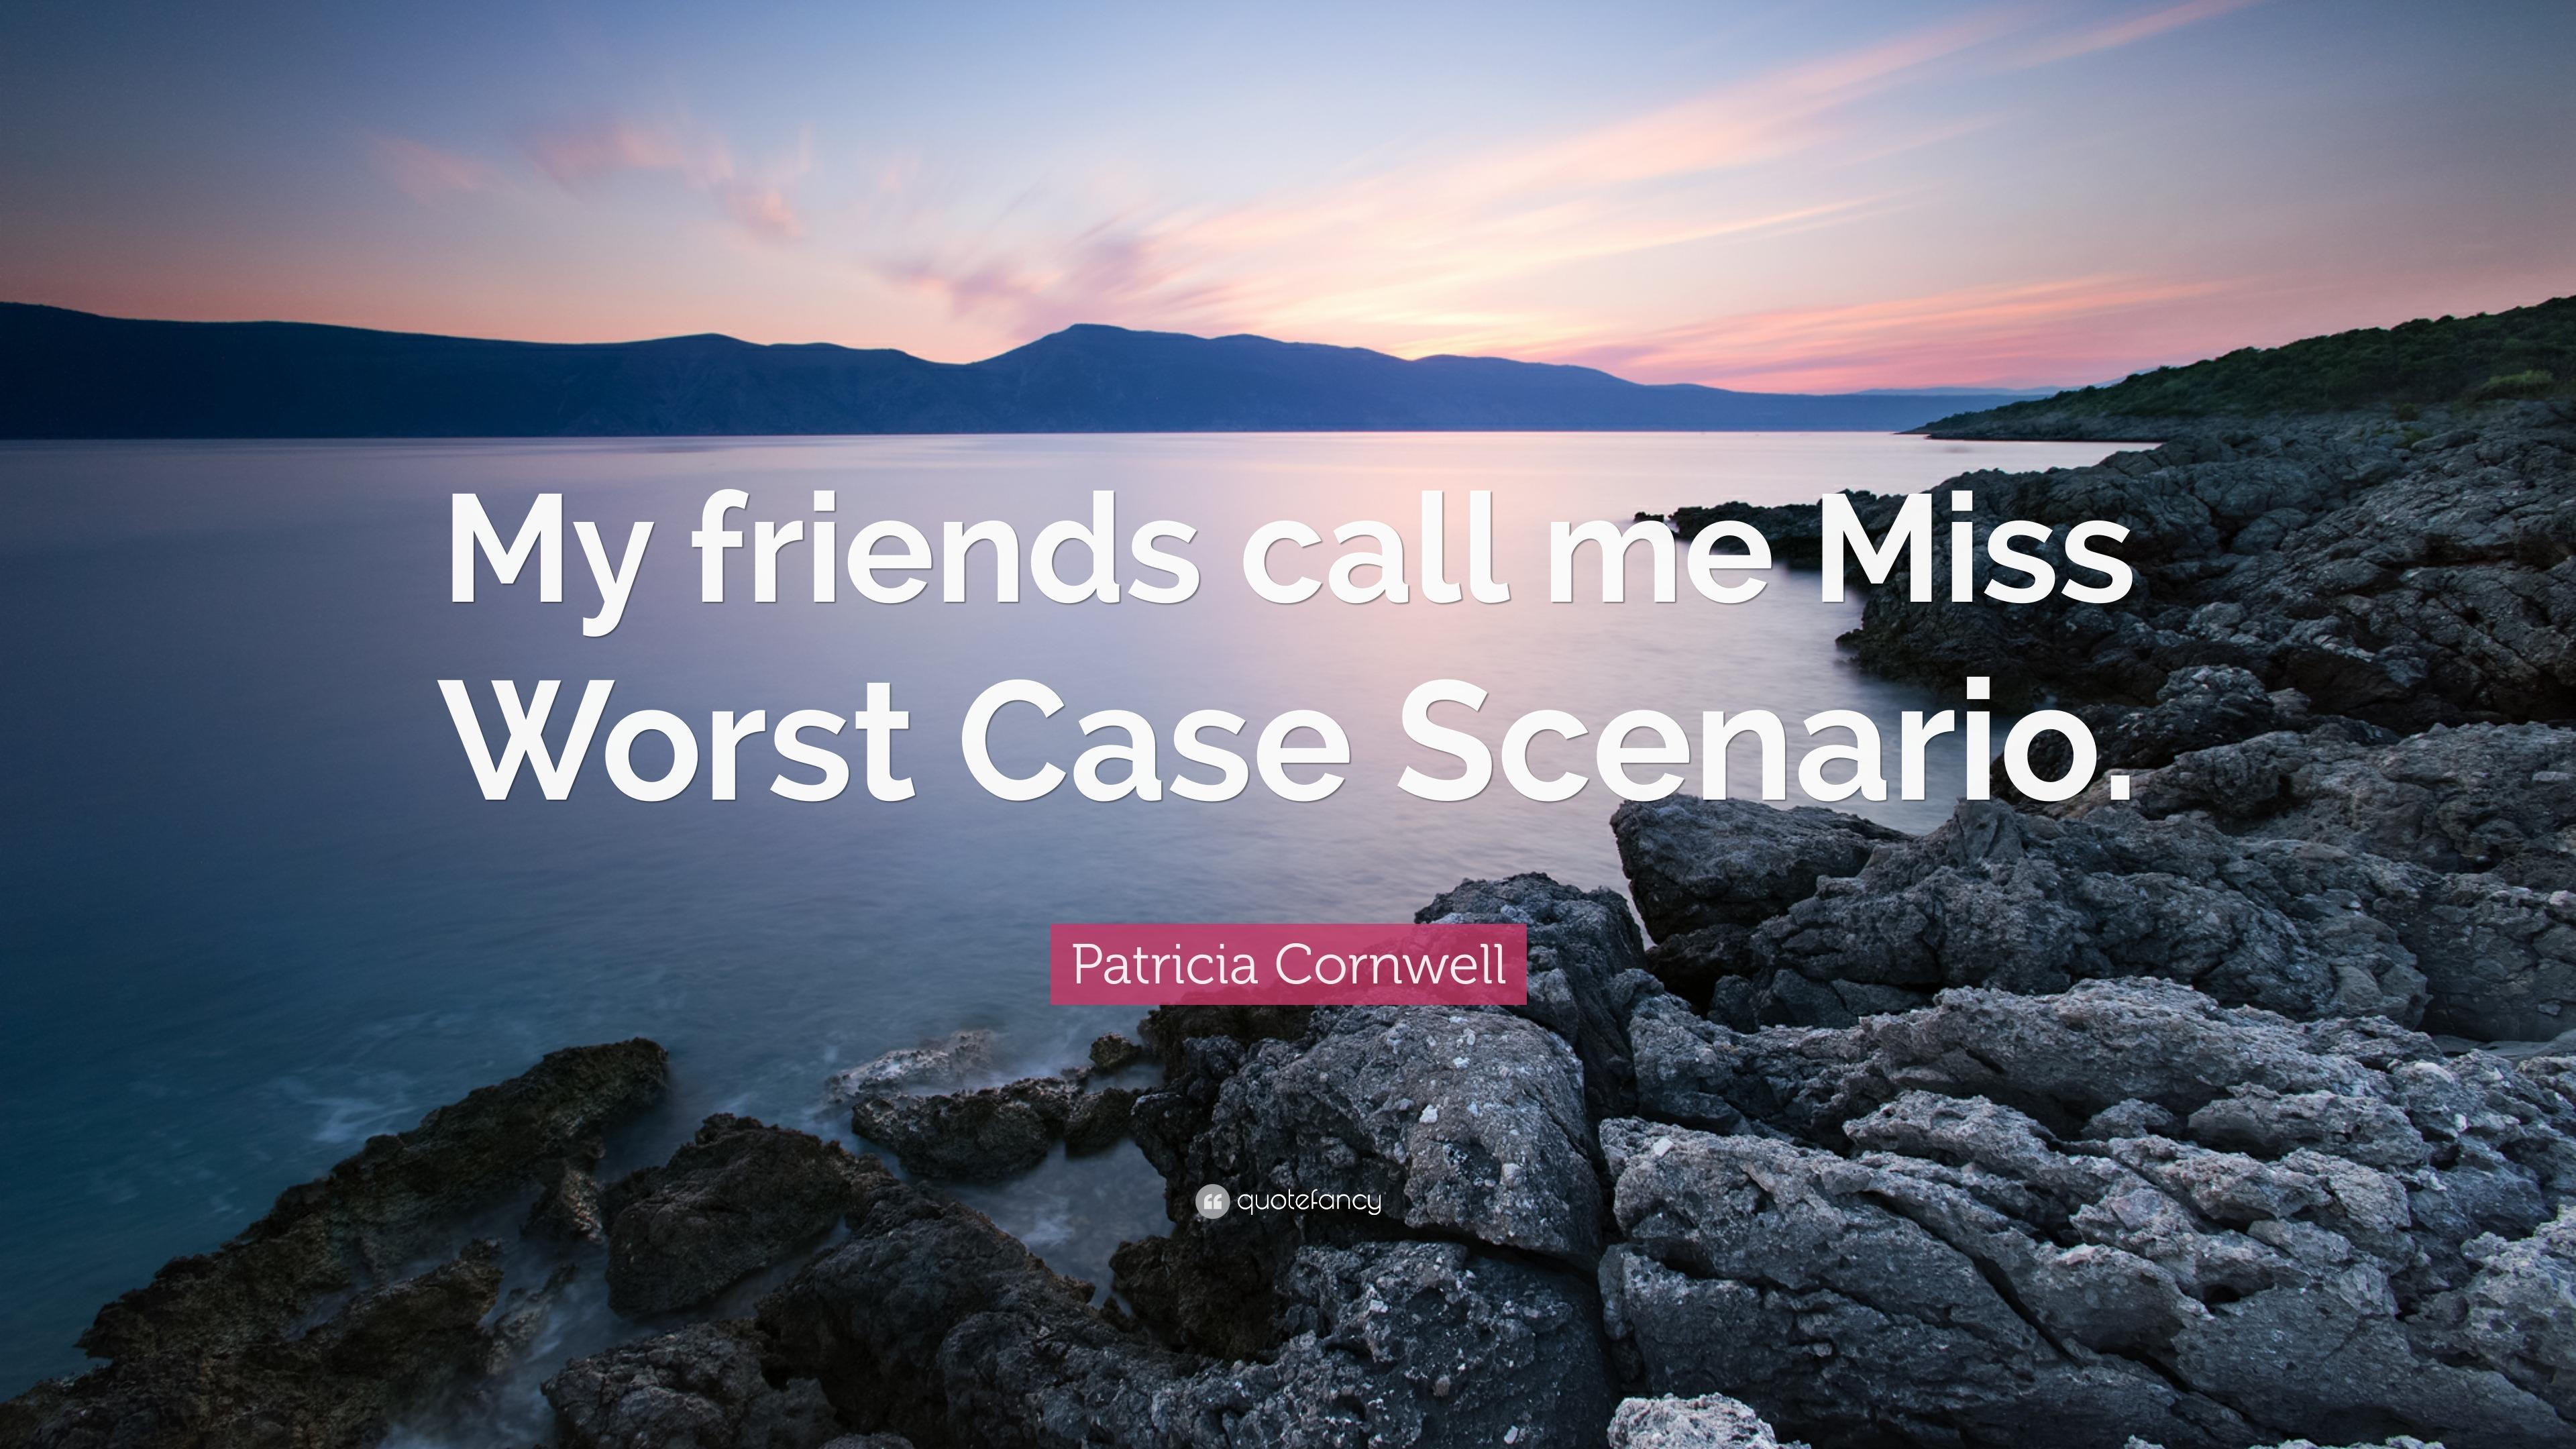 Patricia Cornwell Quote My Friends Call Me Miss Worst Case Scenario